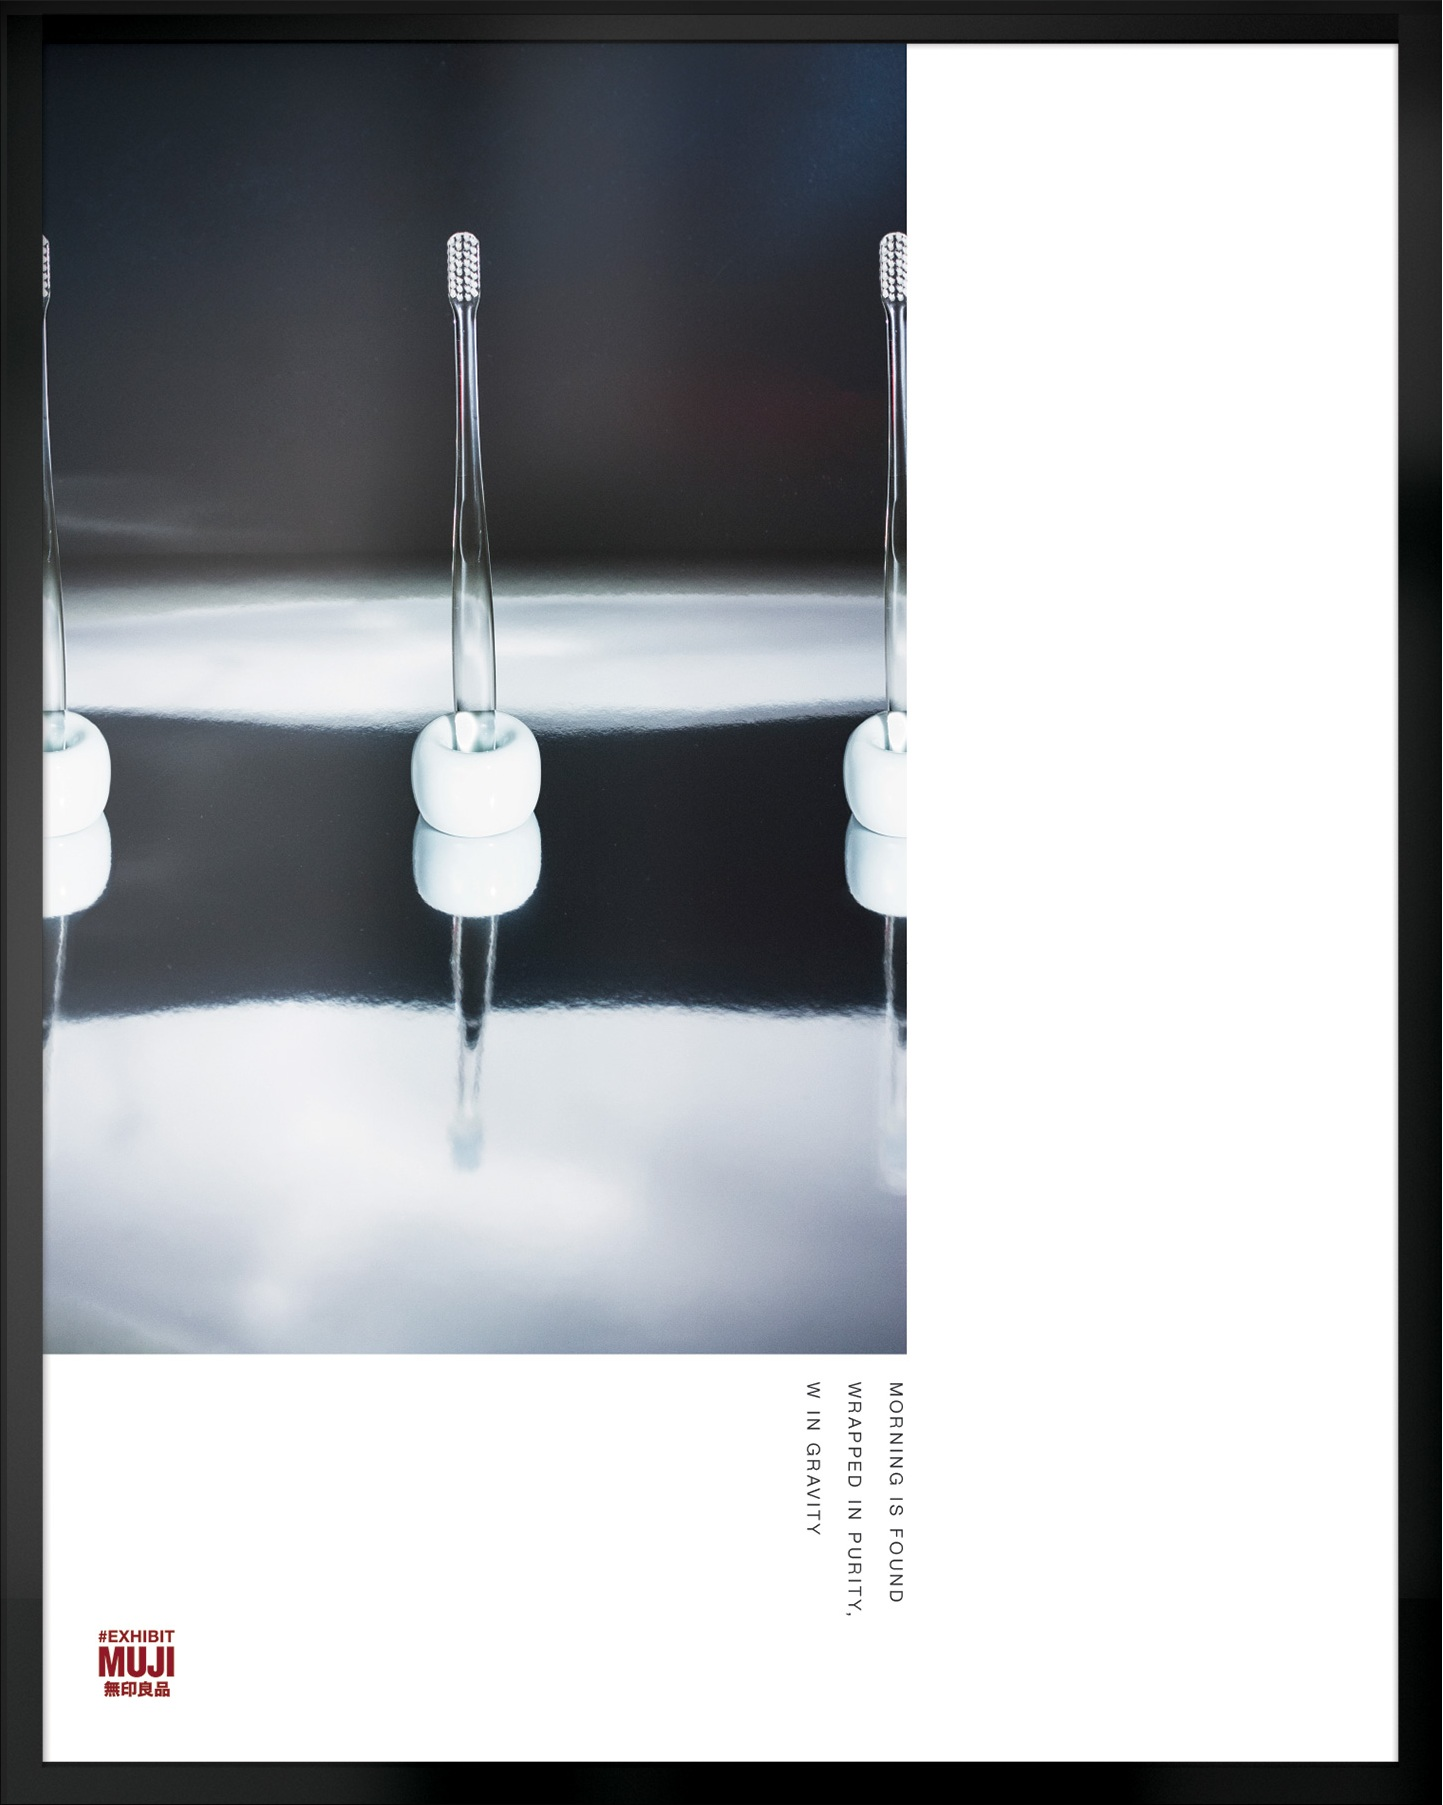 web-toothbrush.jpg